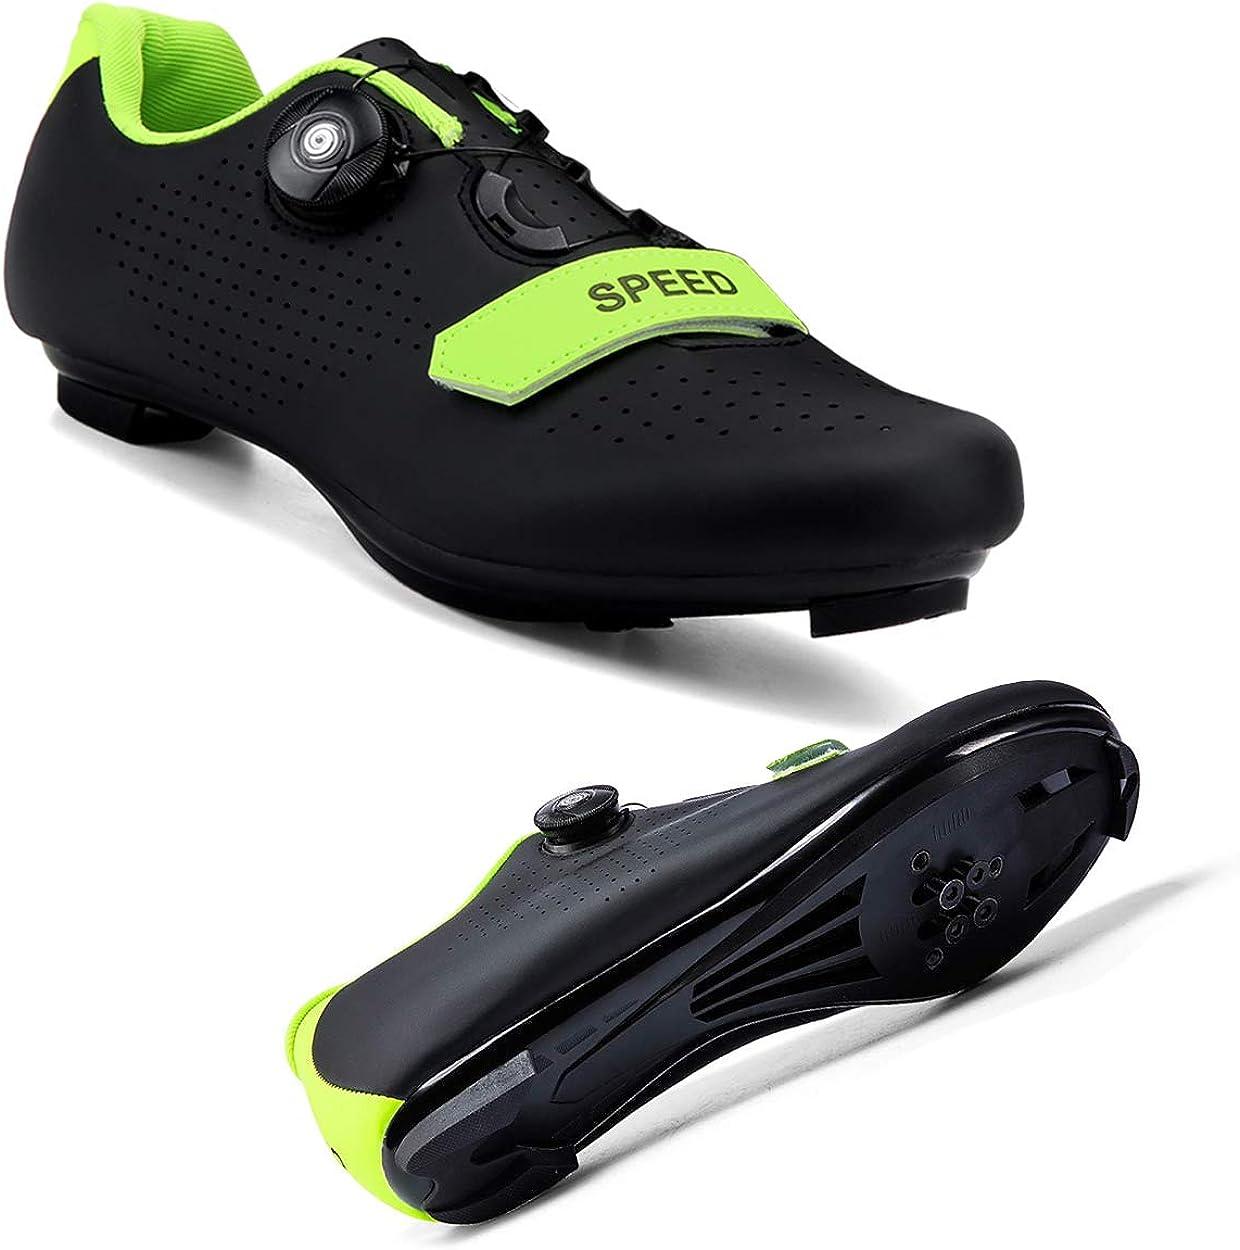 Joseph Haywood New product!! 2021 Luxury Women Cycling Road Compatib Bike Shoes